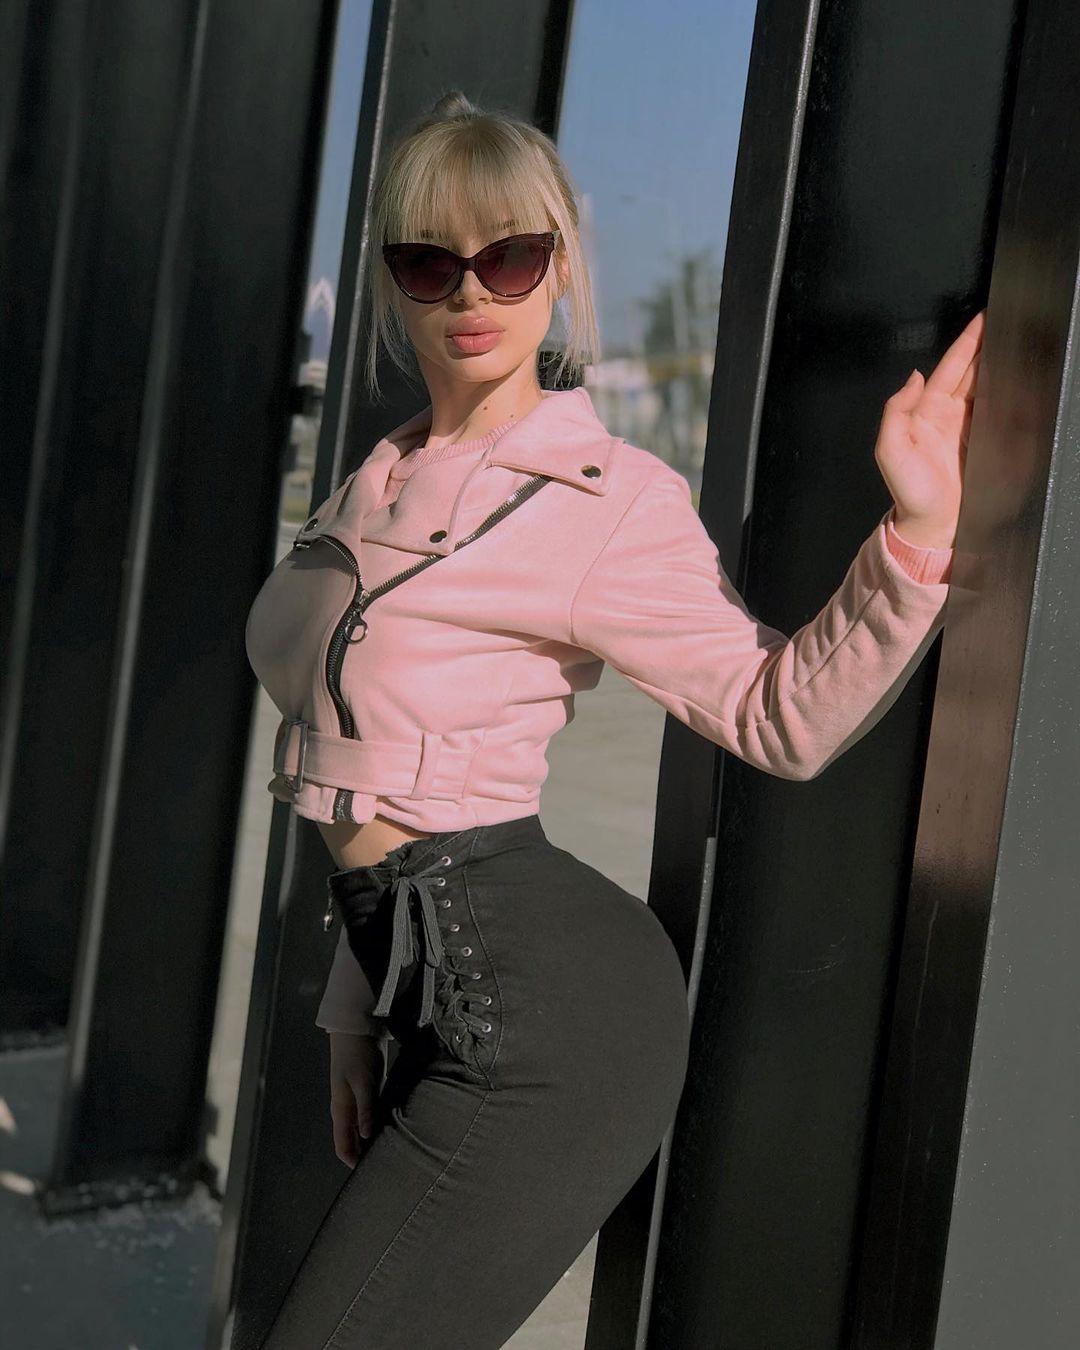 Jana-Zivkovic-Wallpapers-Insta-Fit-Bio-2